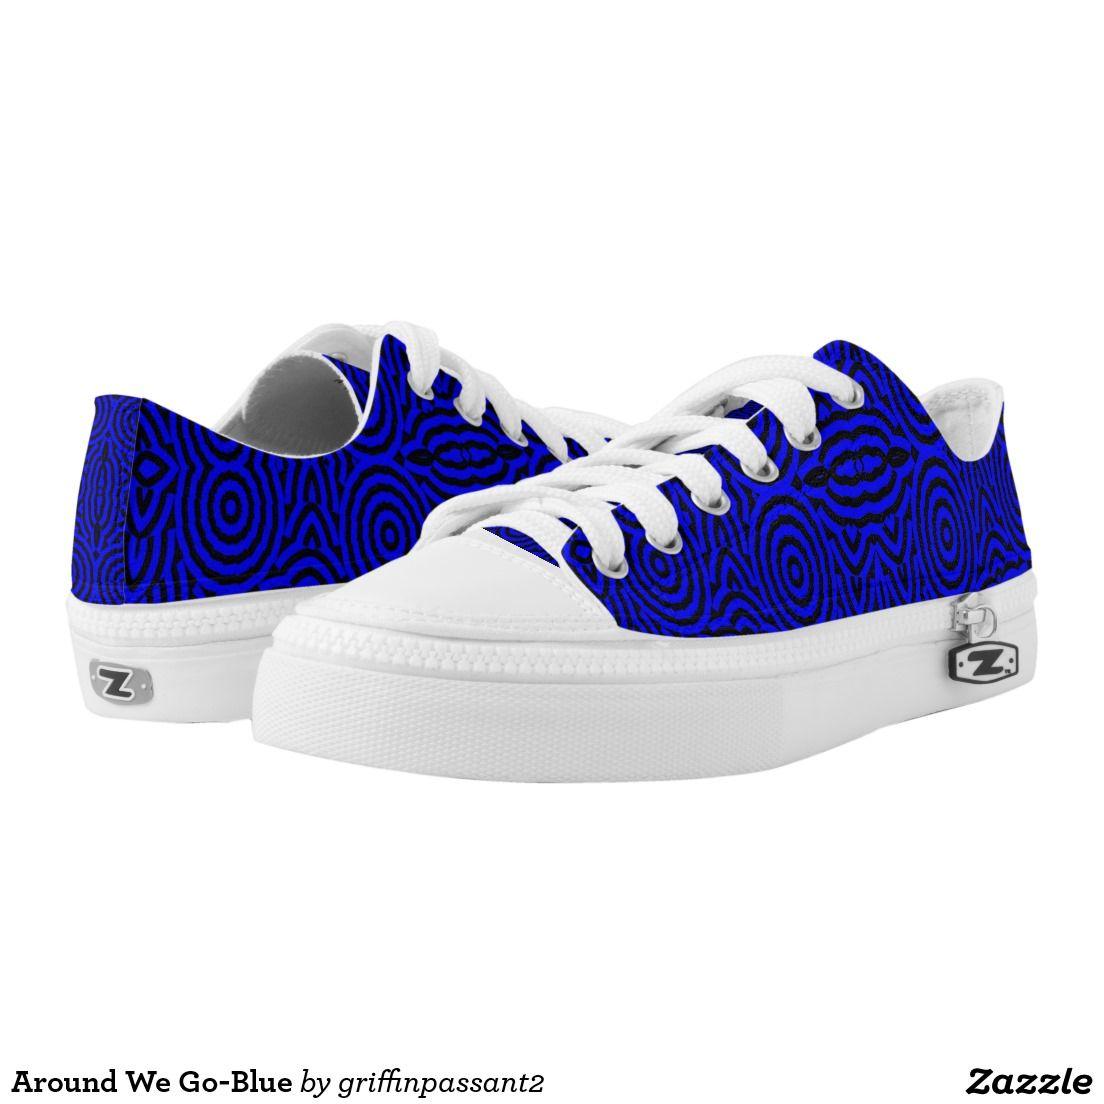 Around We Go-Blue Printed Shoes